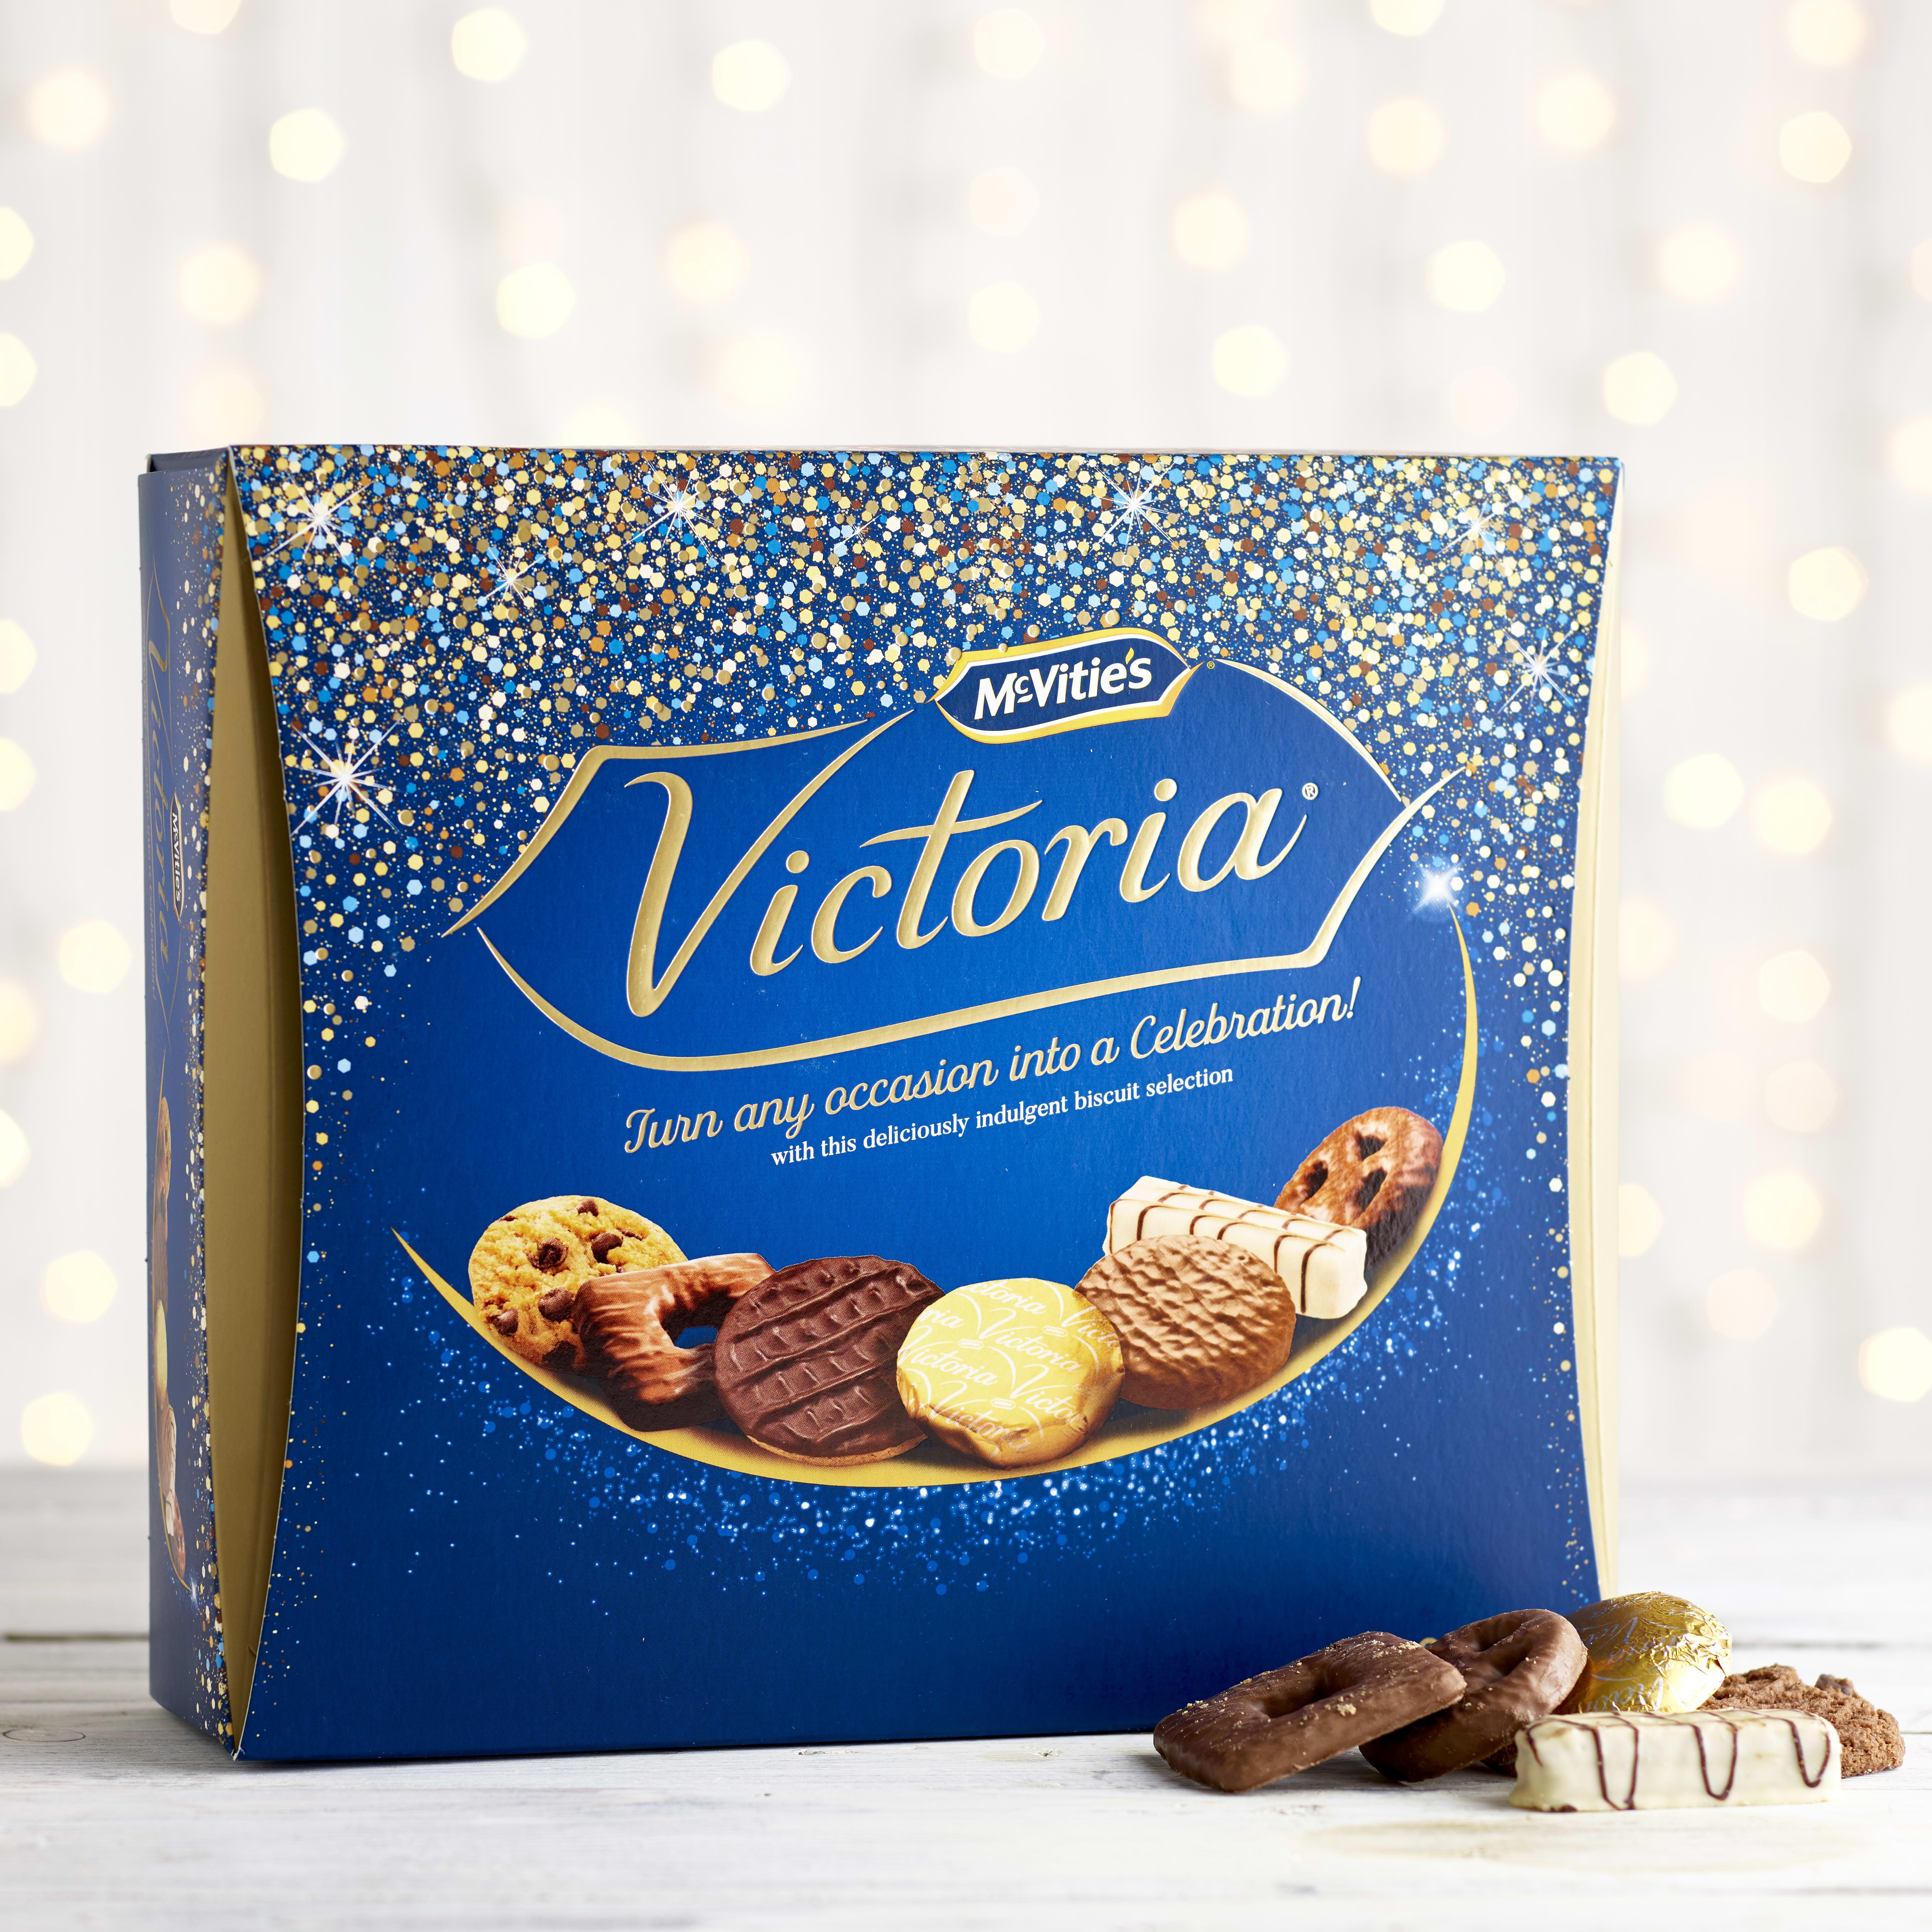 McVitie's Victoria Assortment 600g